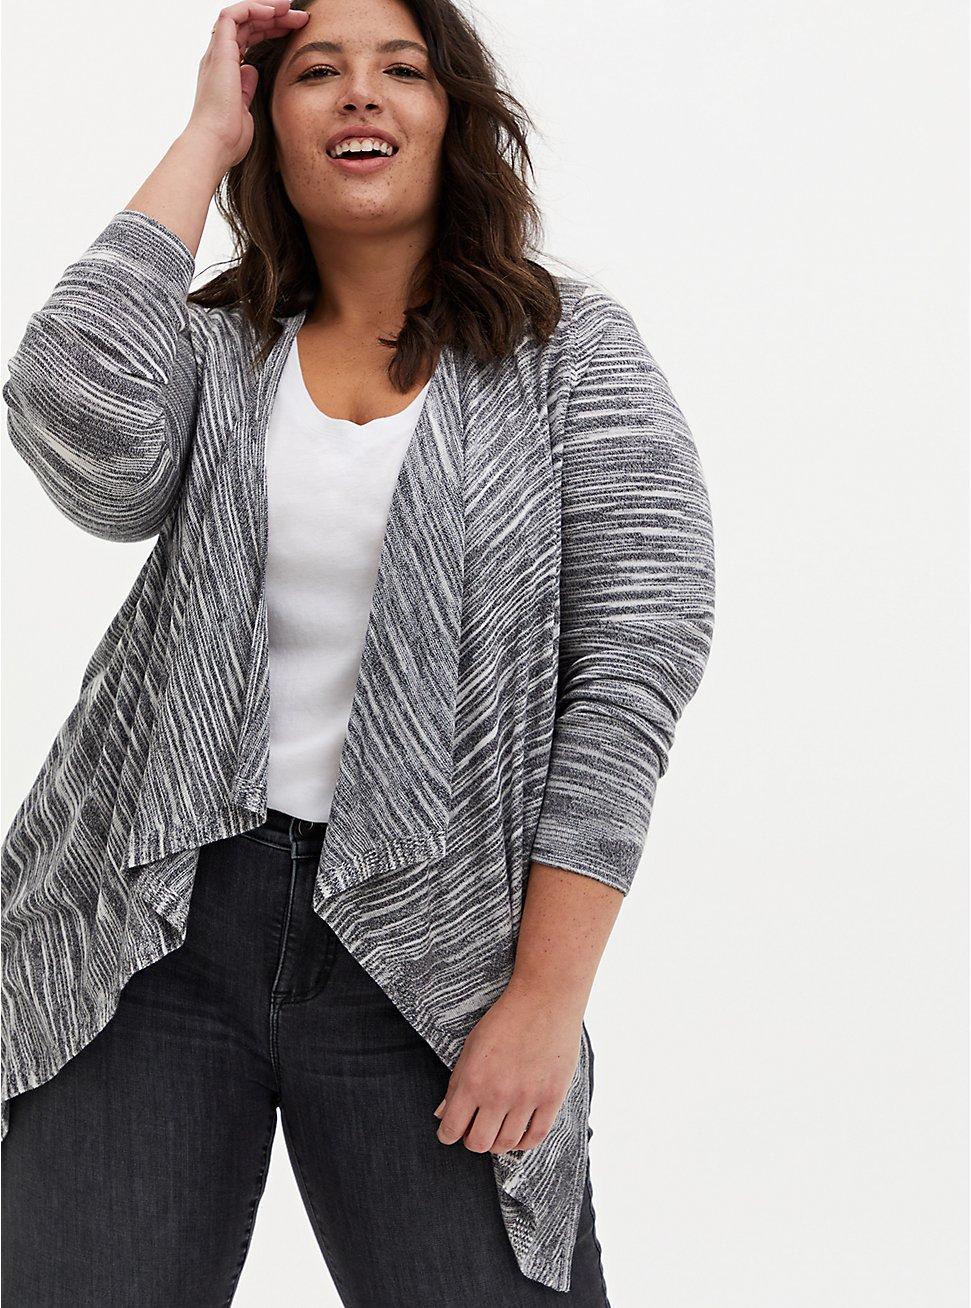 Black & White Stripe Space-Dye Cardigan Sweater, MULTI, hi-res